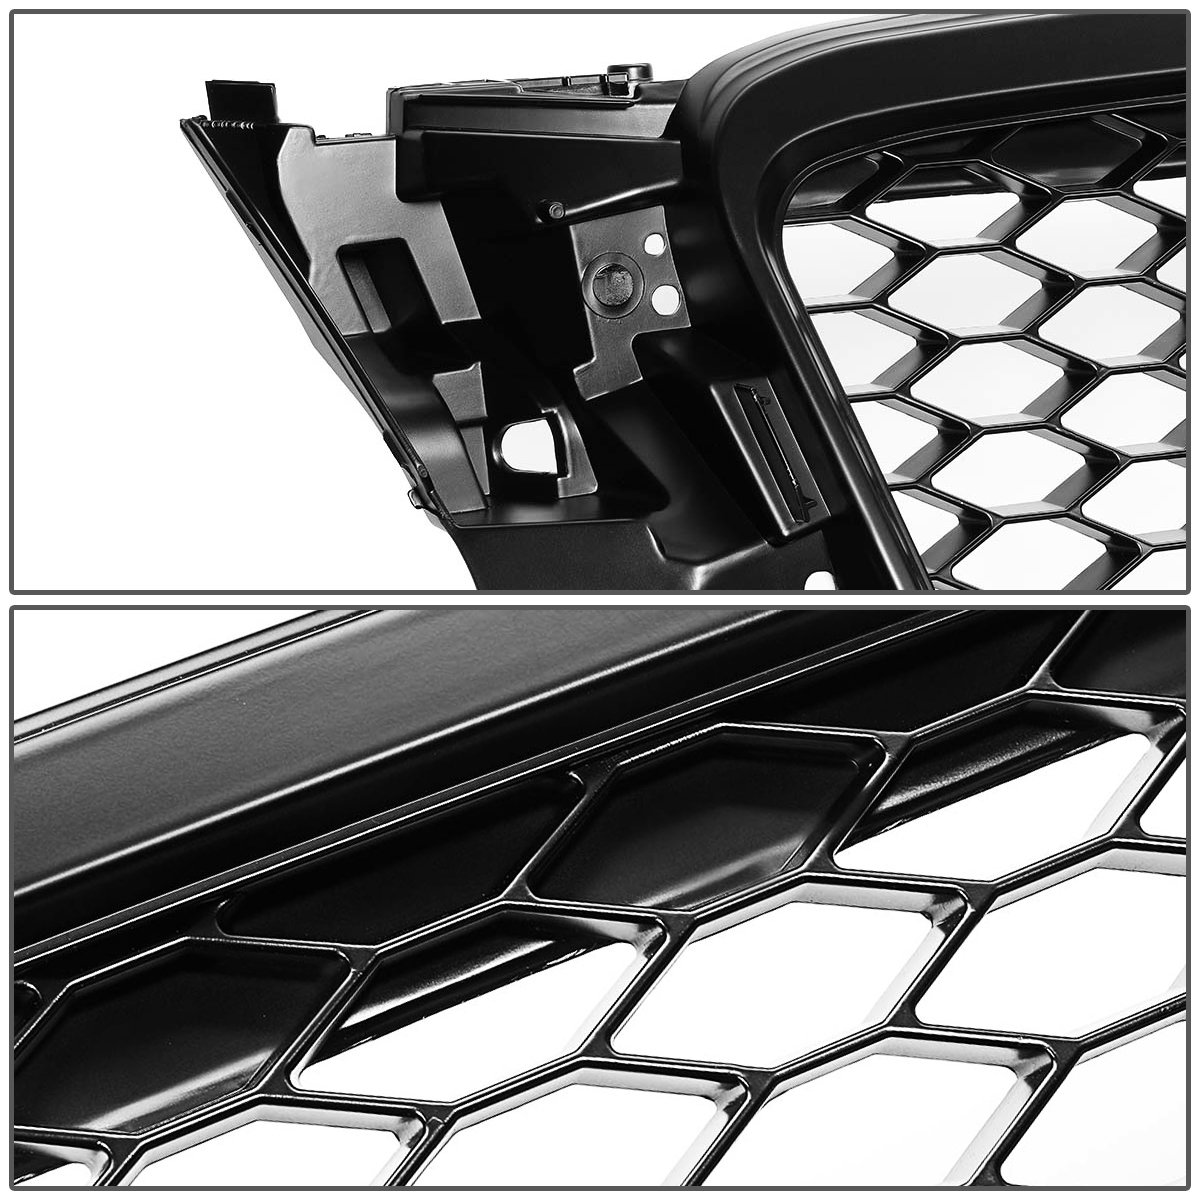 For 08-11 Audi A4 Quattro DNA Motoring GRF-077-BK Front Bumper Grille Guard